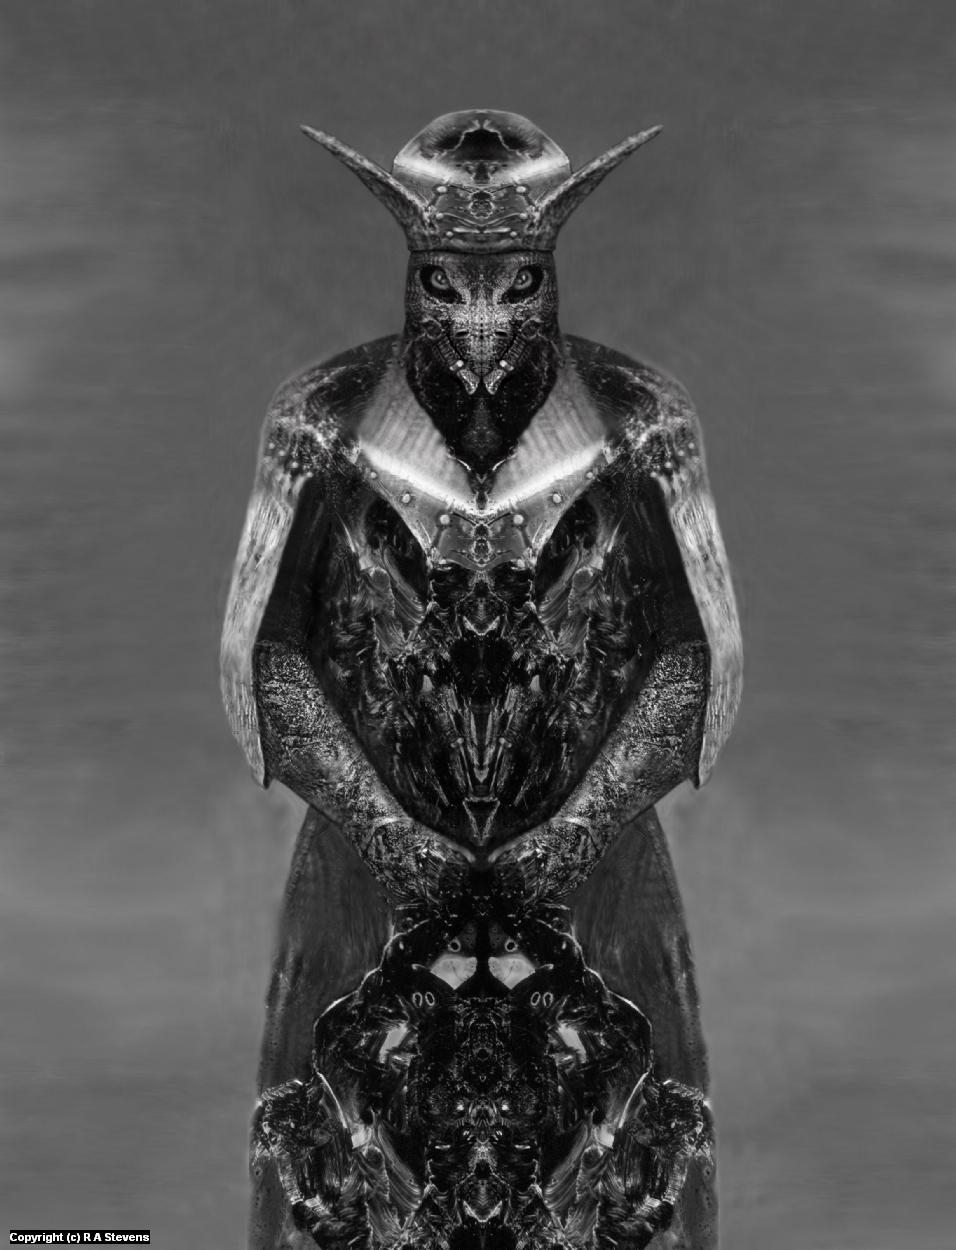 Djinn Warrior Artwork by R Alexander  Stevens